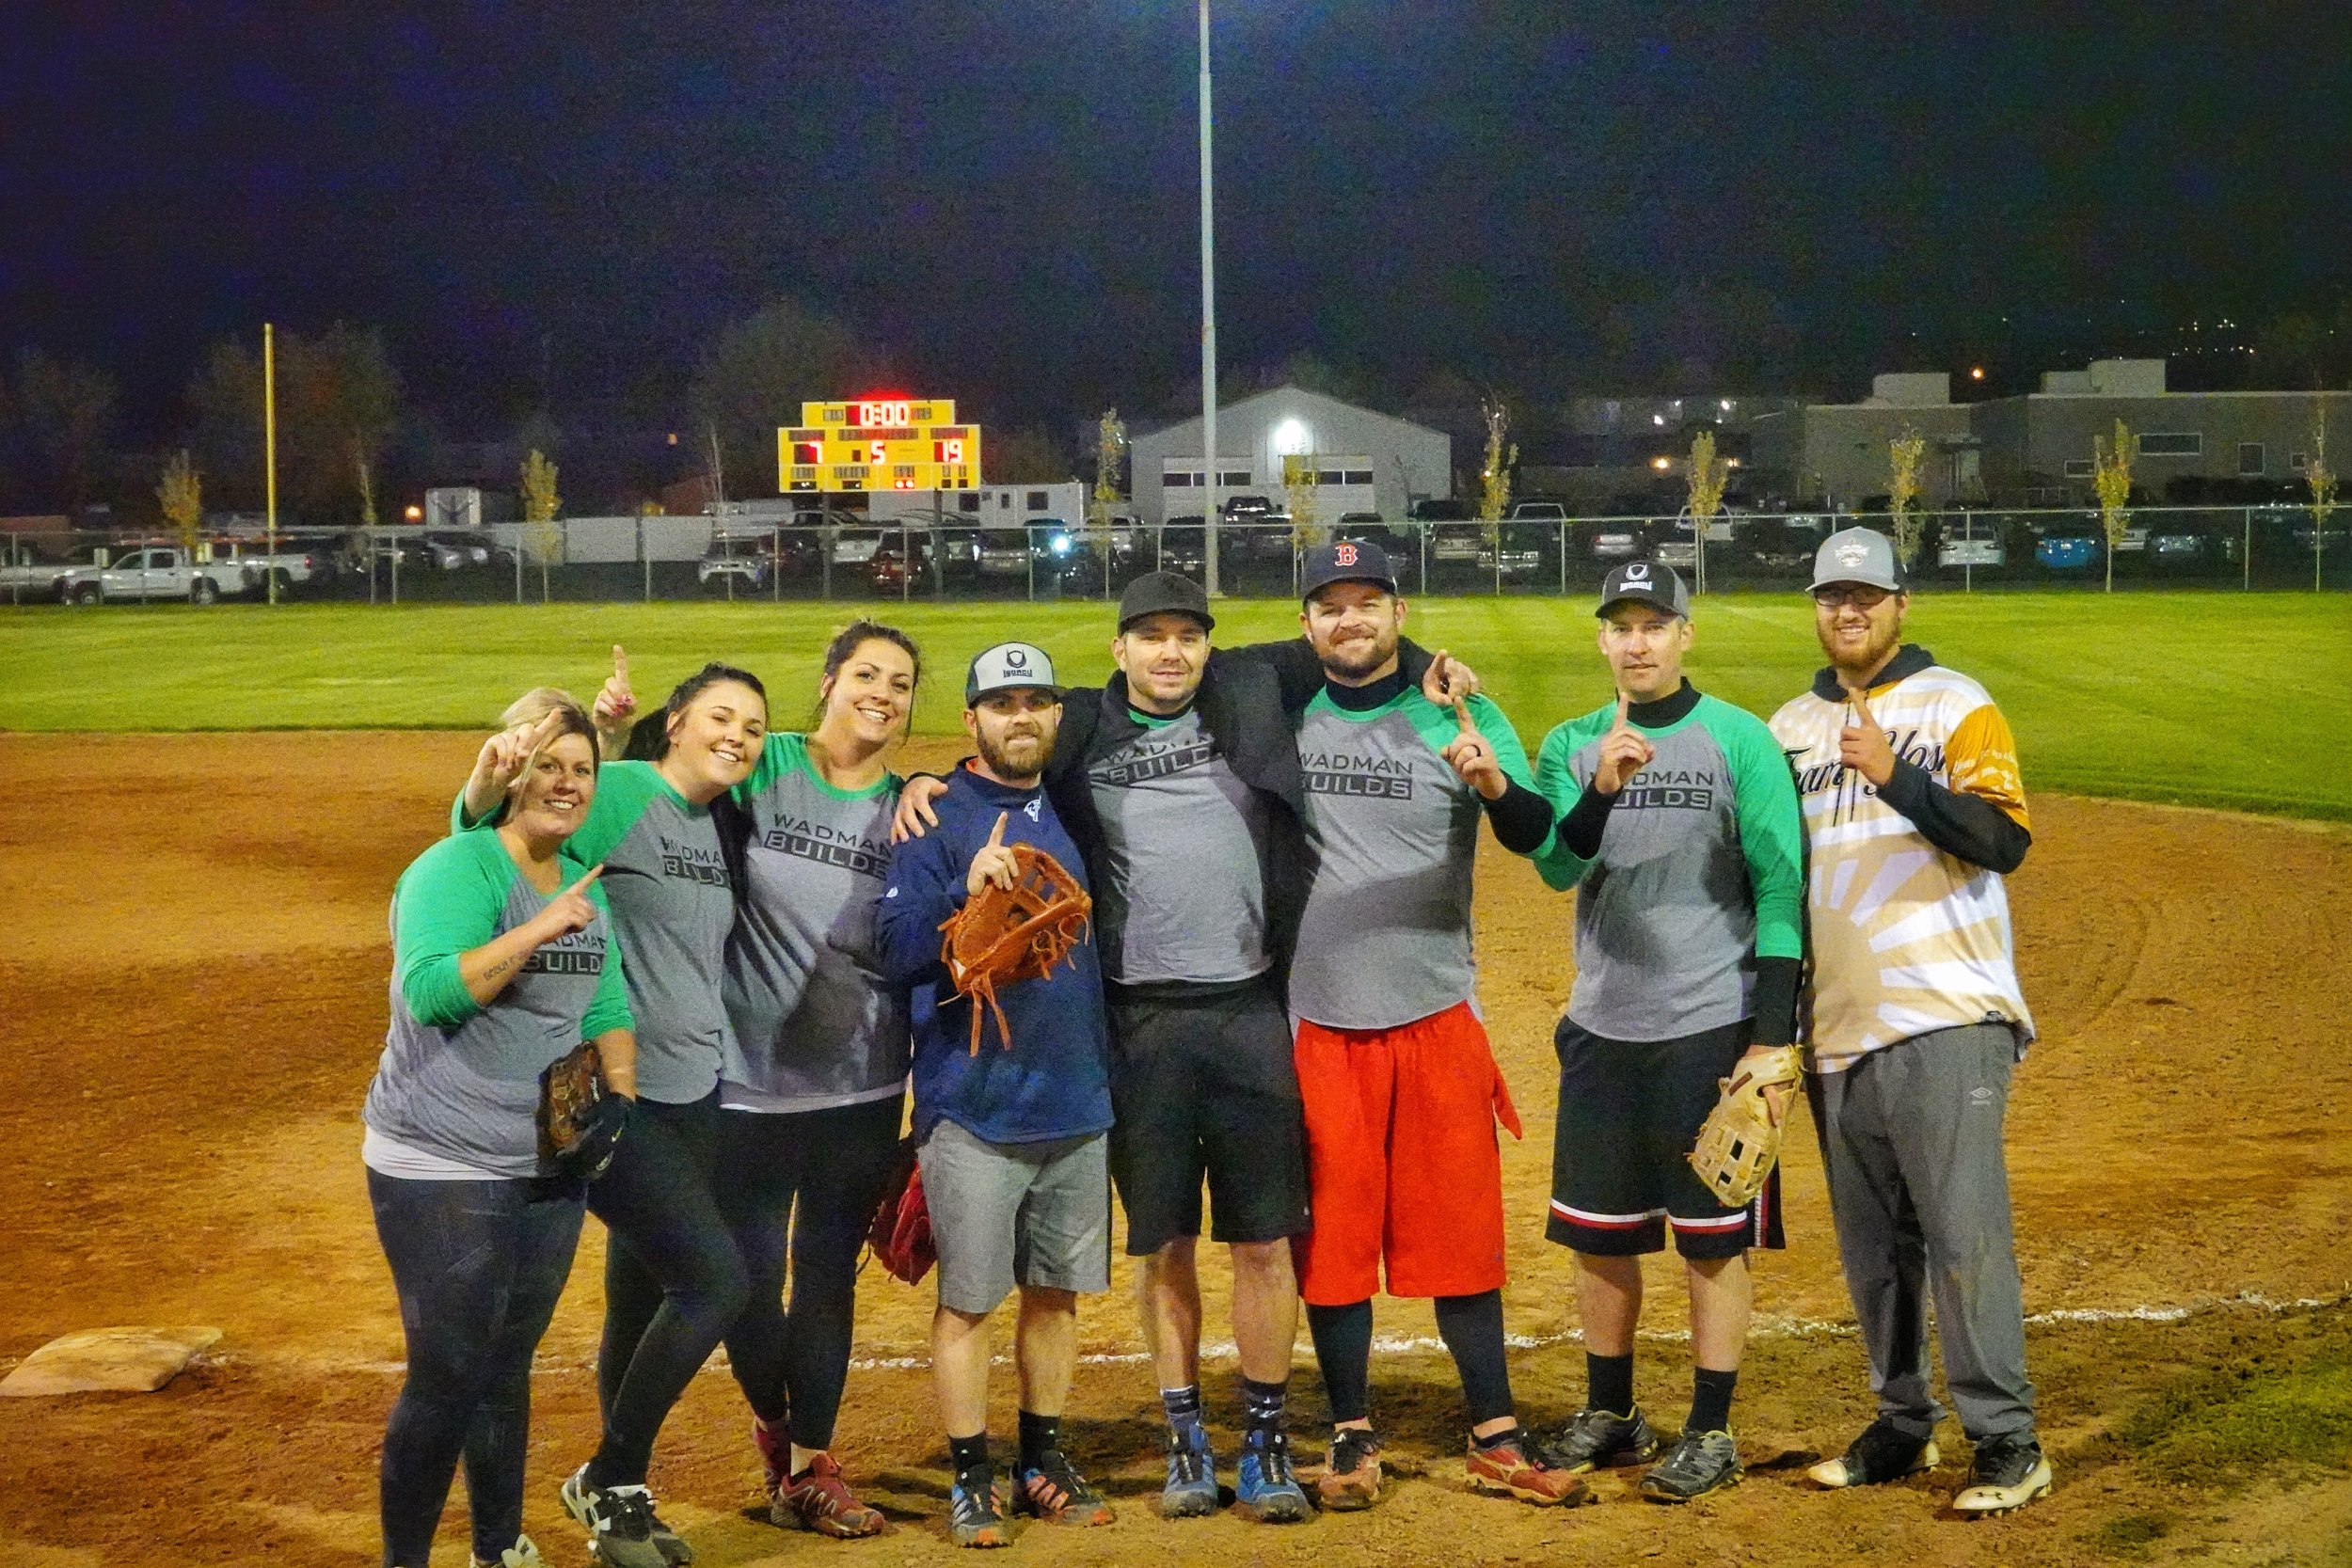 Wadman Softball Team.jpg